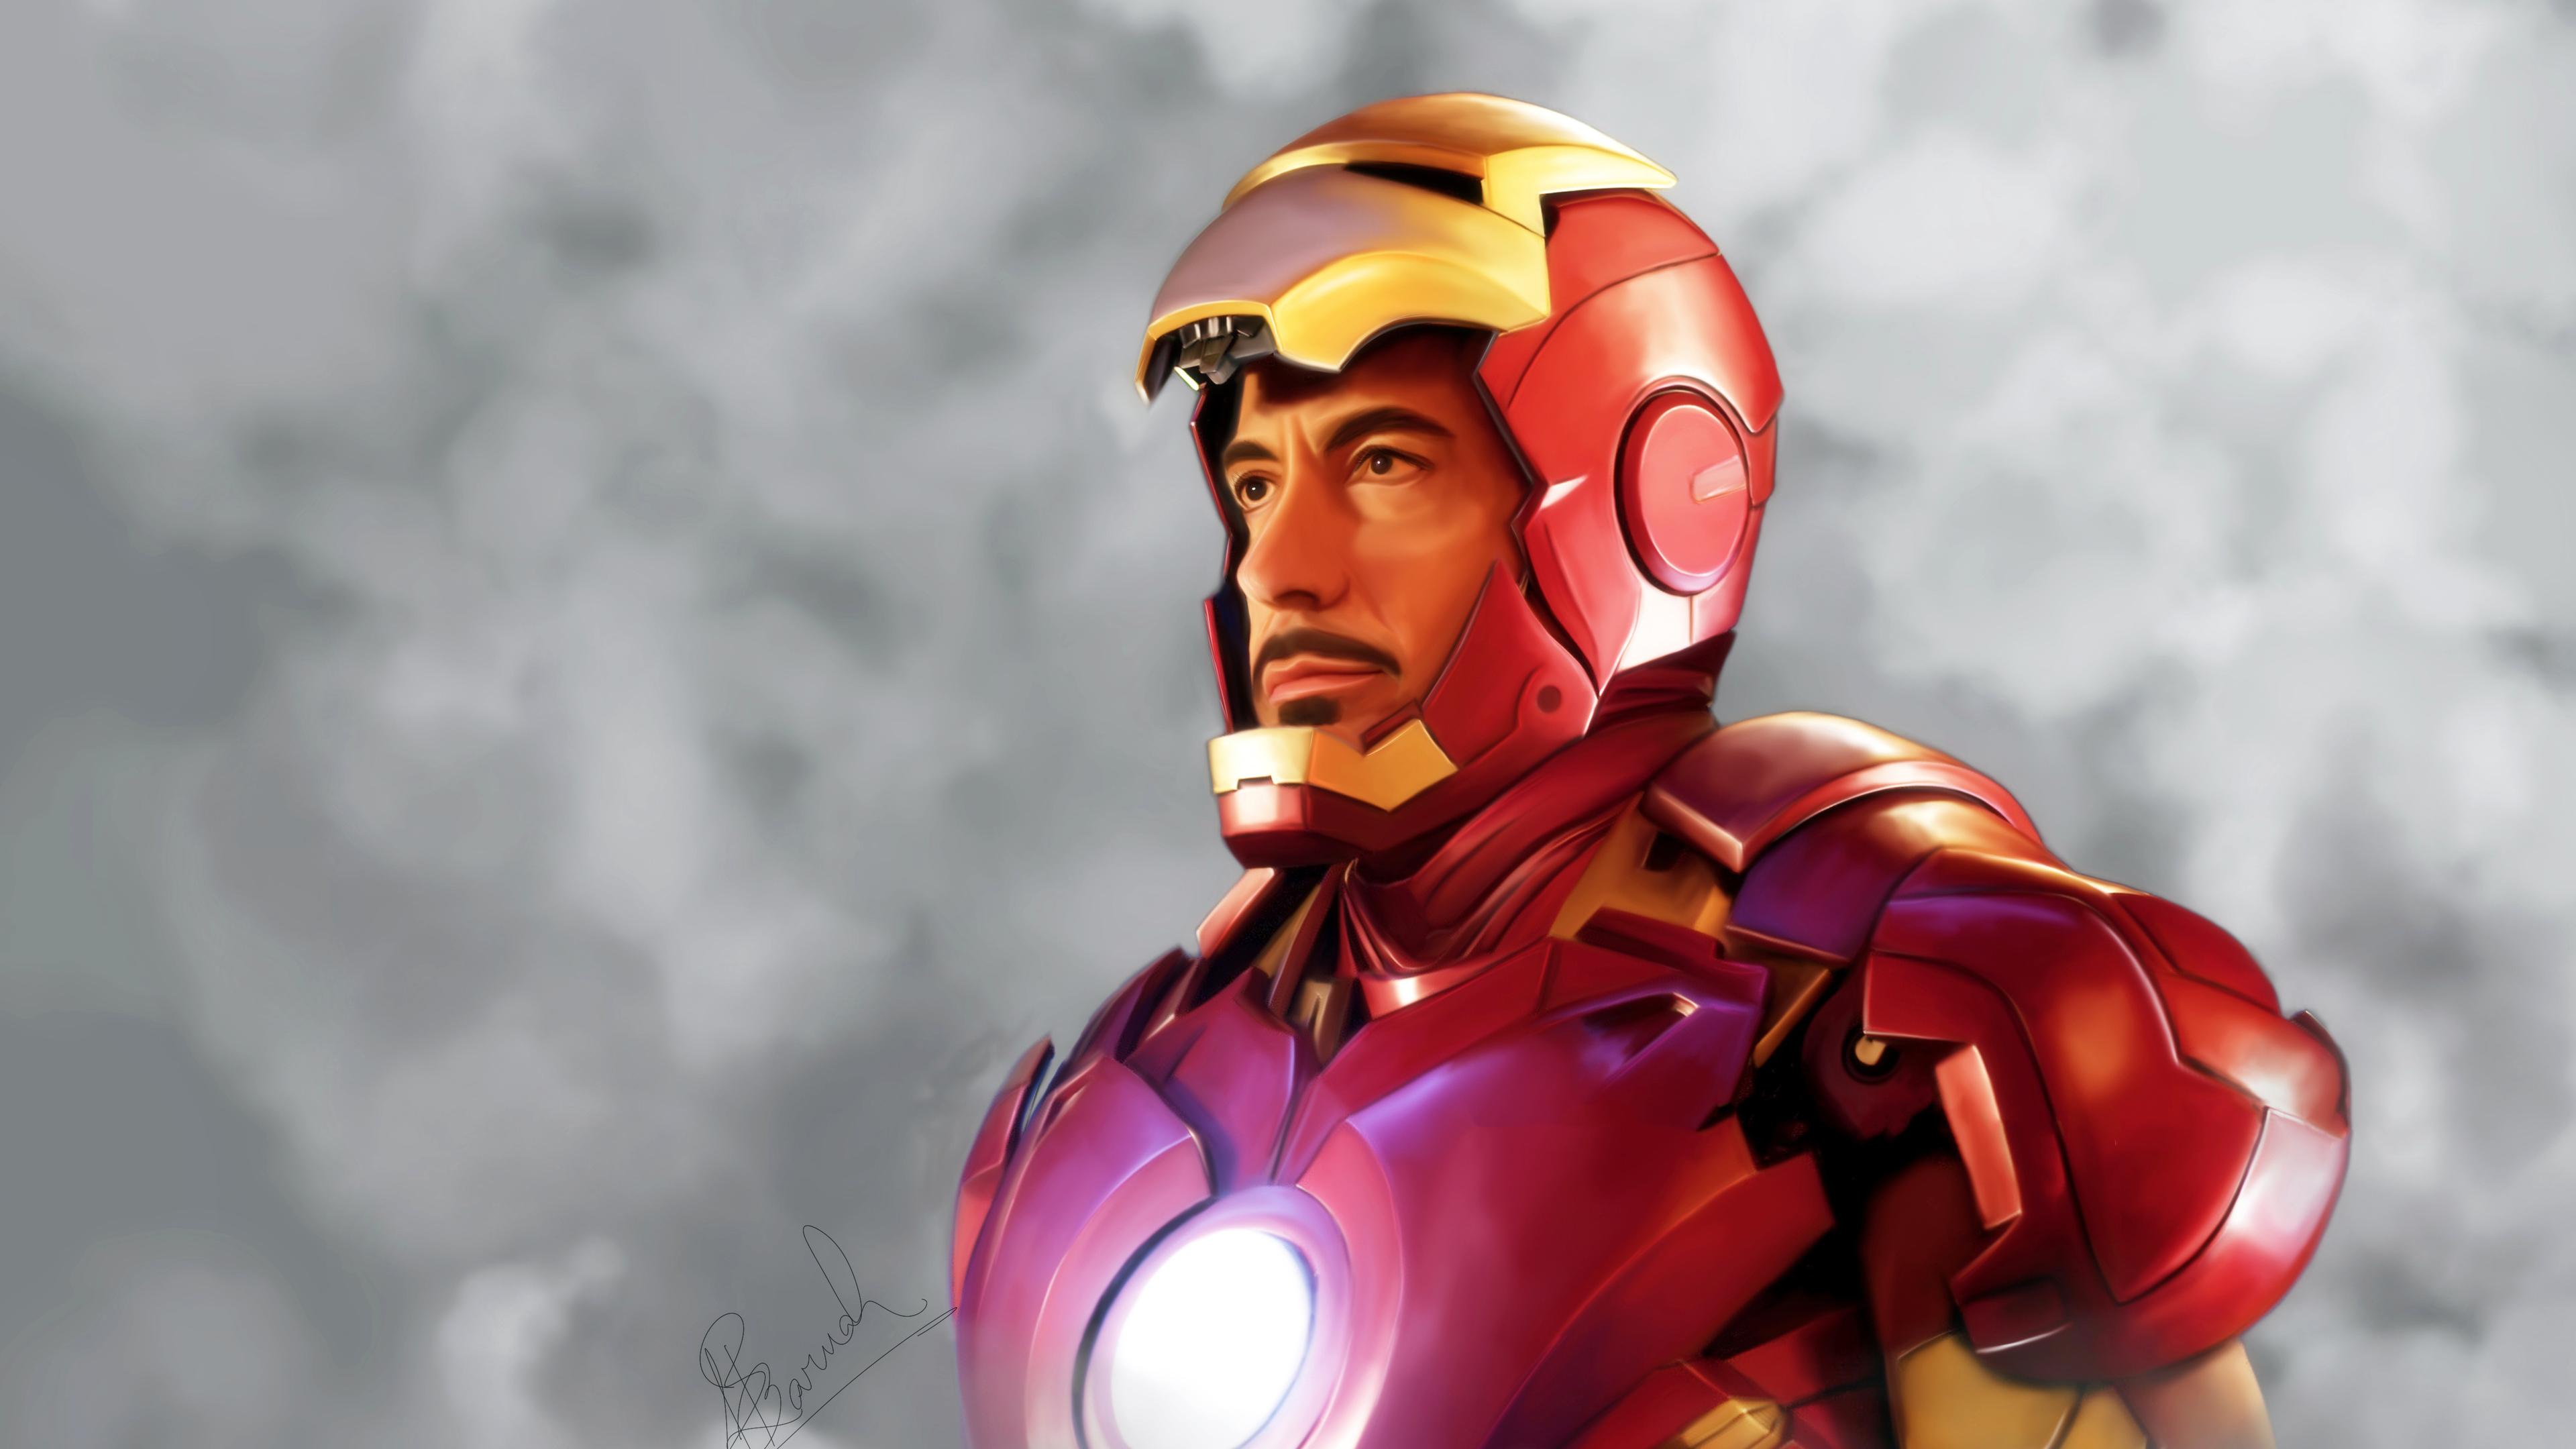 5k iron man 1538786467 - 5k Iron Man - superheroes wallpapers, iron man wallpapers, hd-wallpapers, deviantart wallpapers, artwork wallpapers, artist wallpapers, 5k wallpapers, 4k-wallpapers